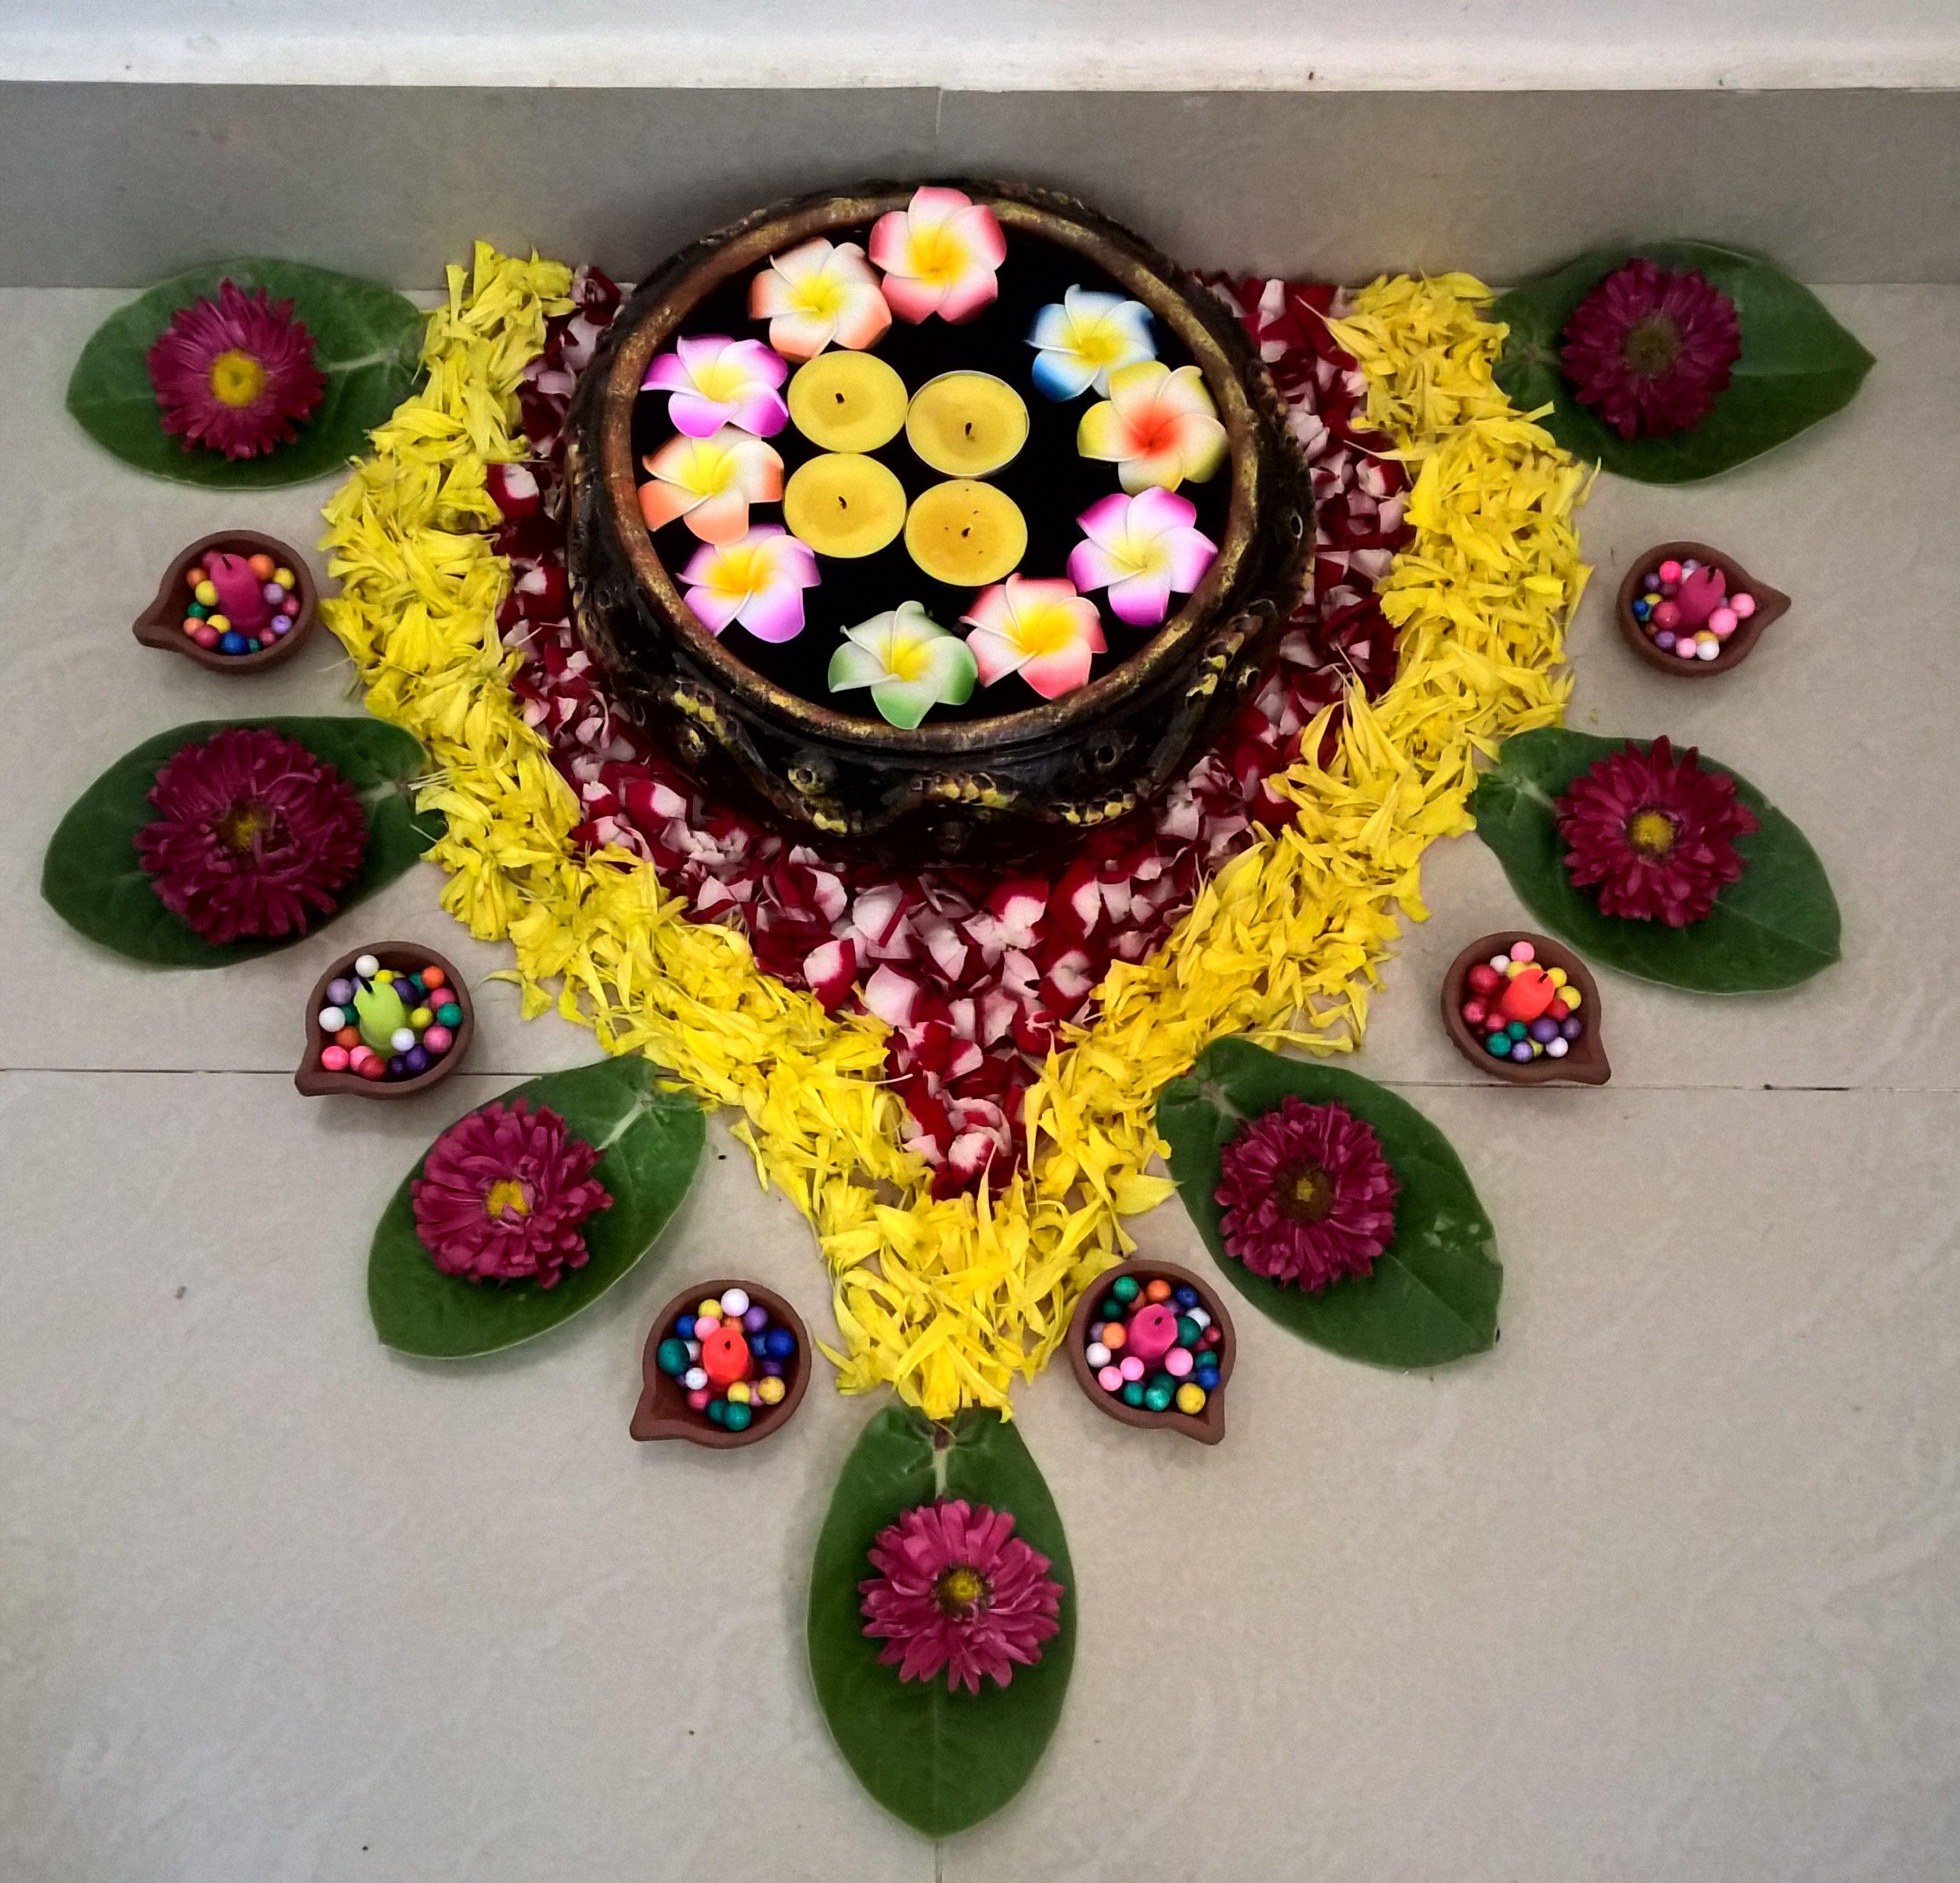 Diwali Flower Design Rangolid Pinterest Diwali Flower Designs